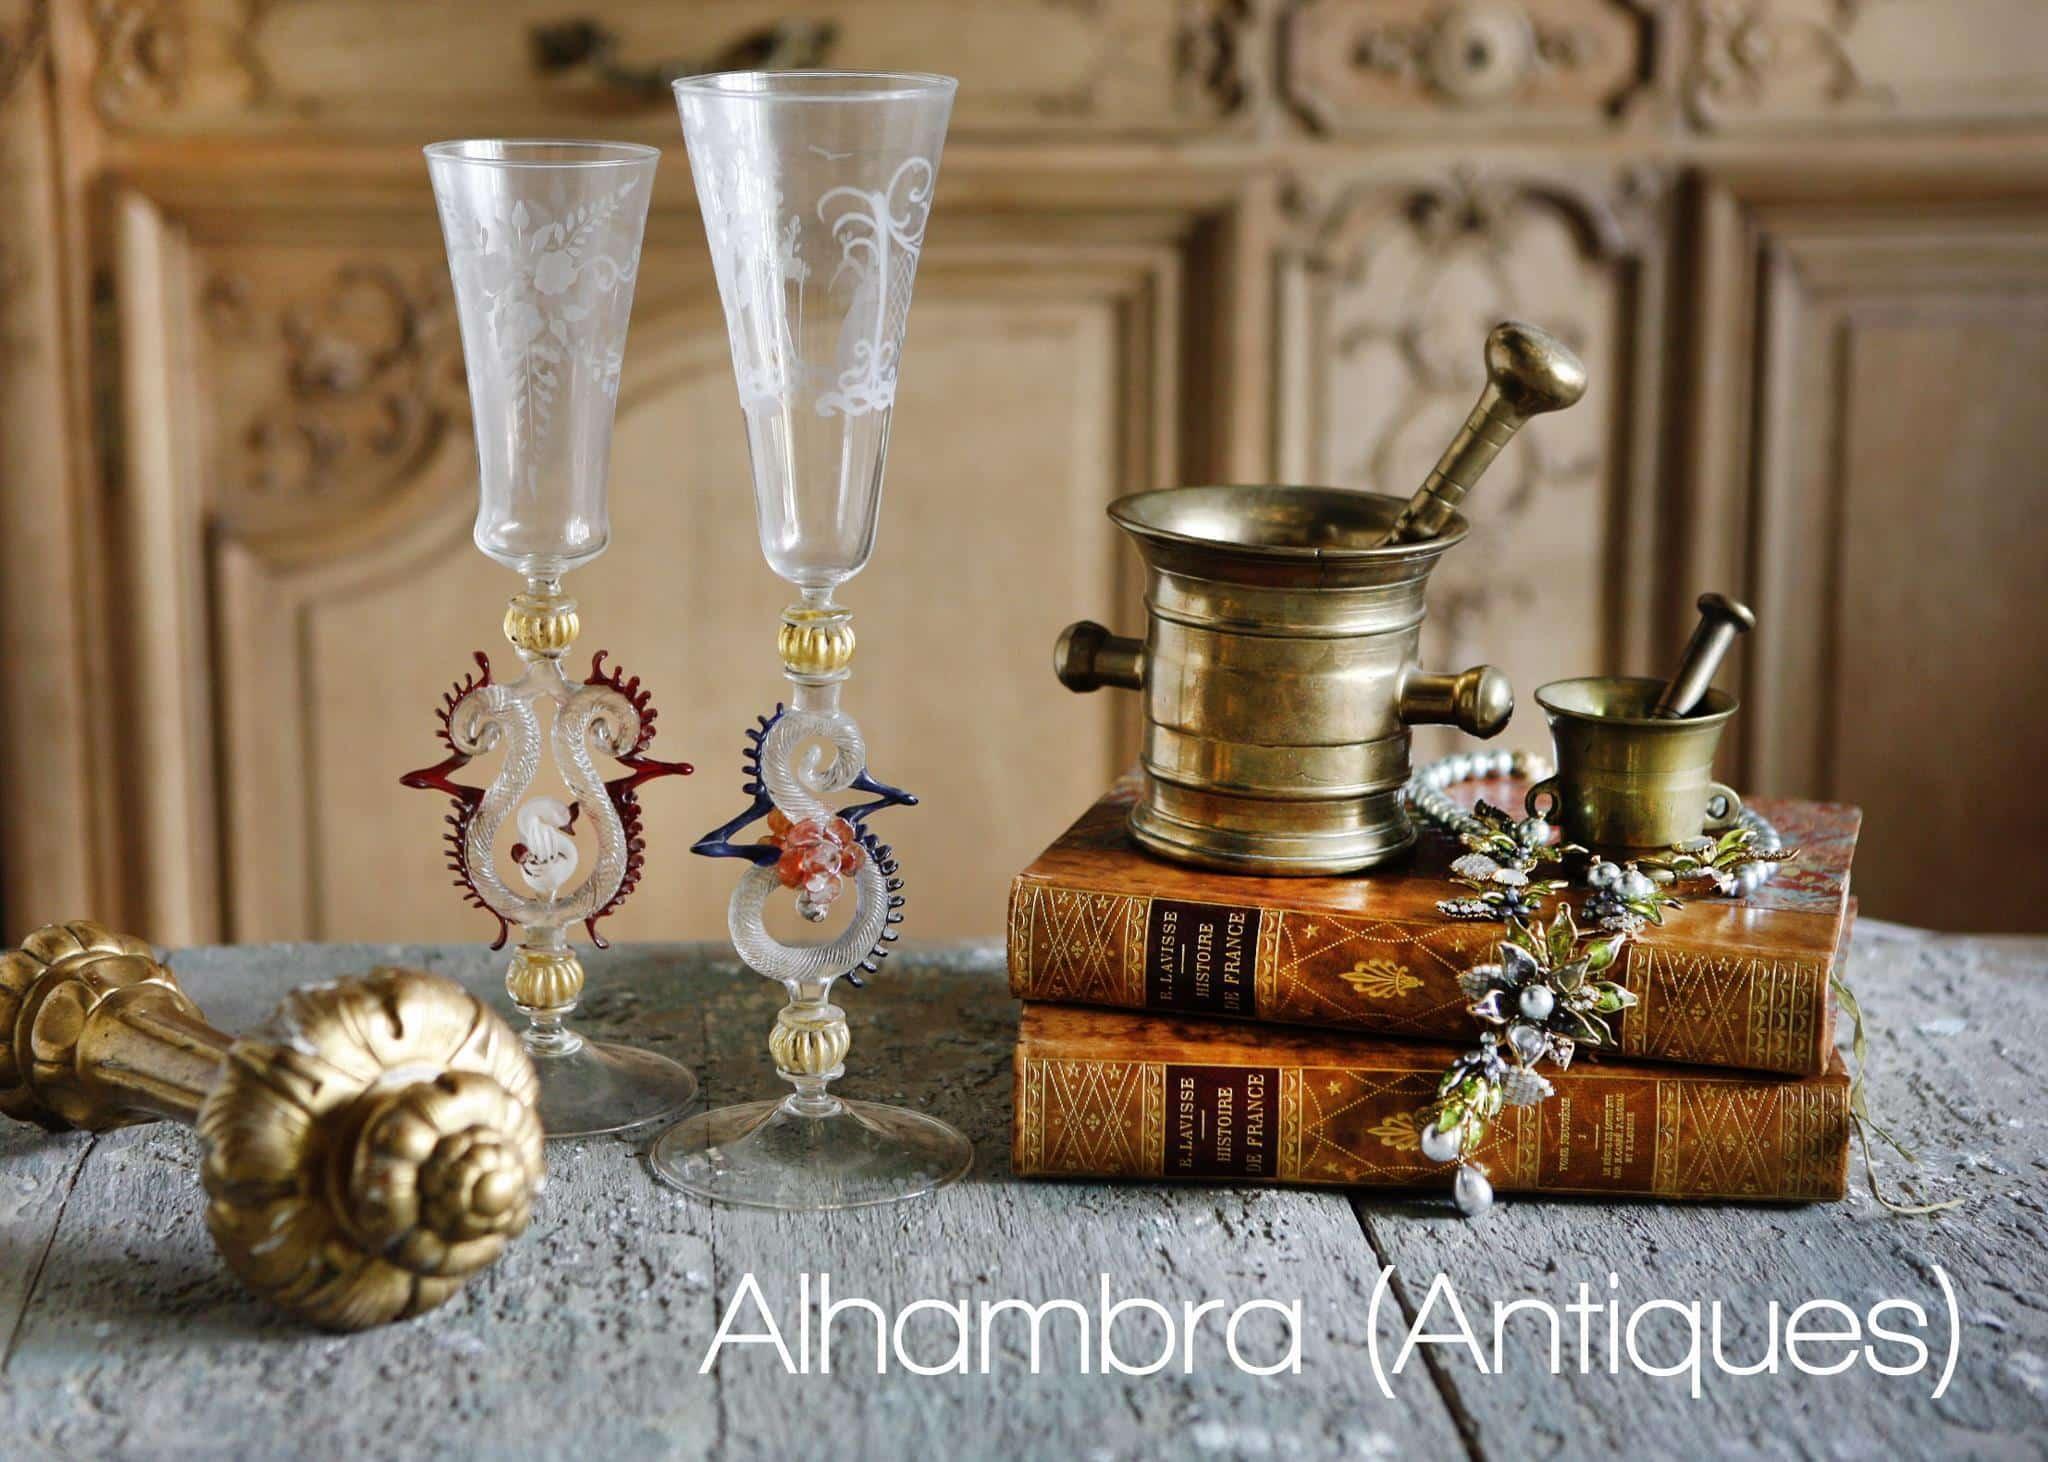 Alhambra (Antiques)